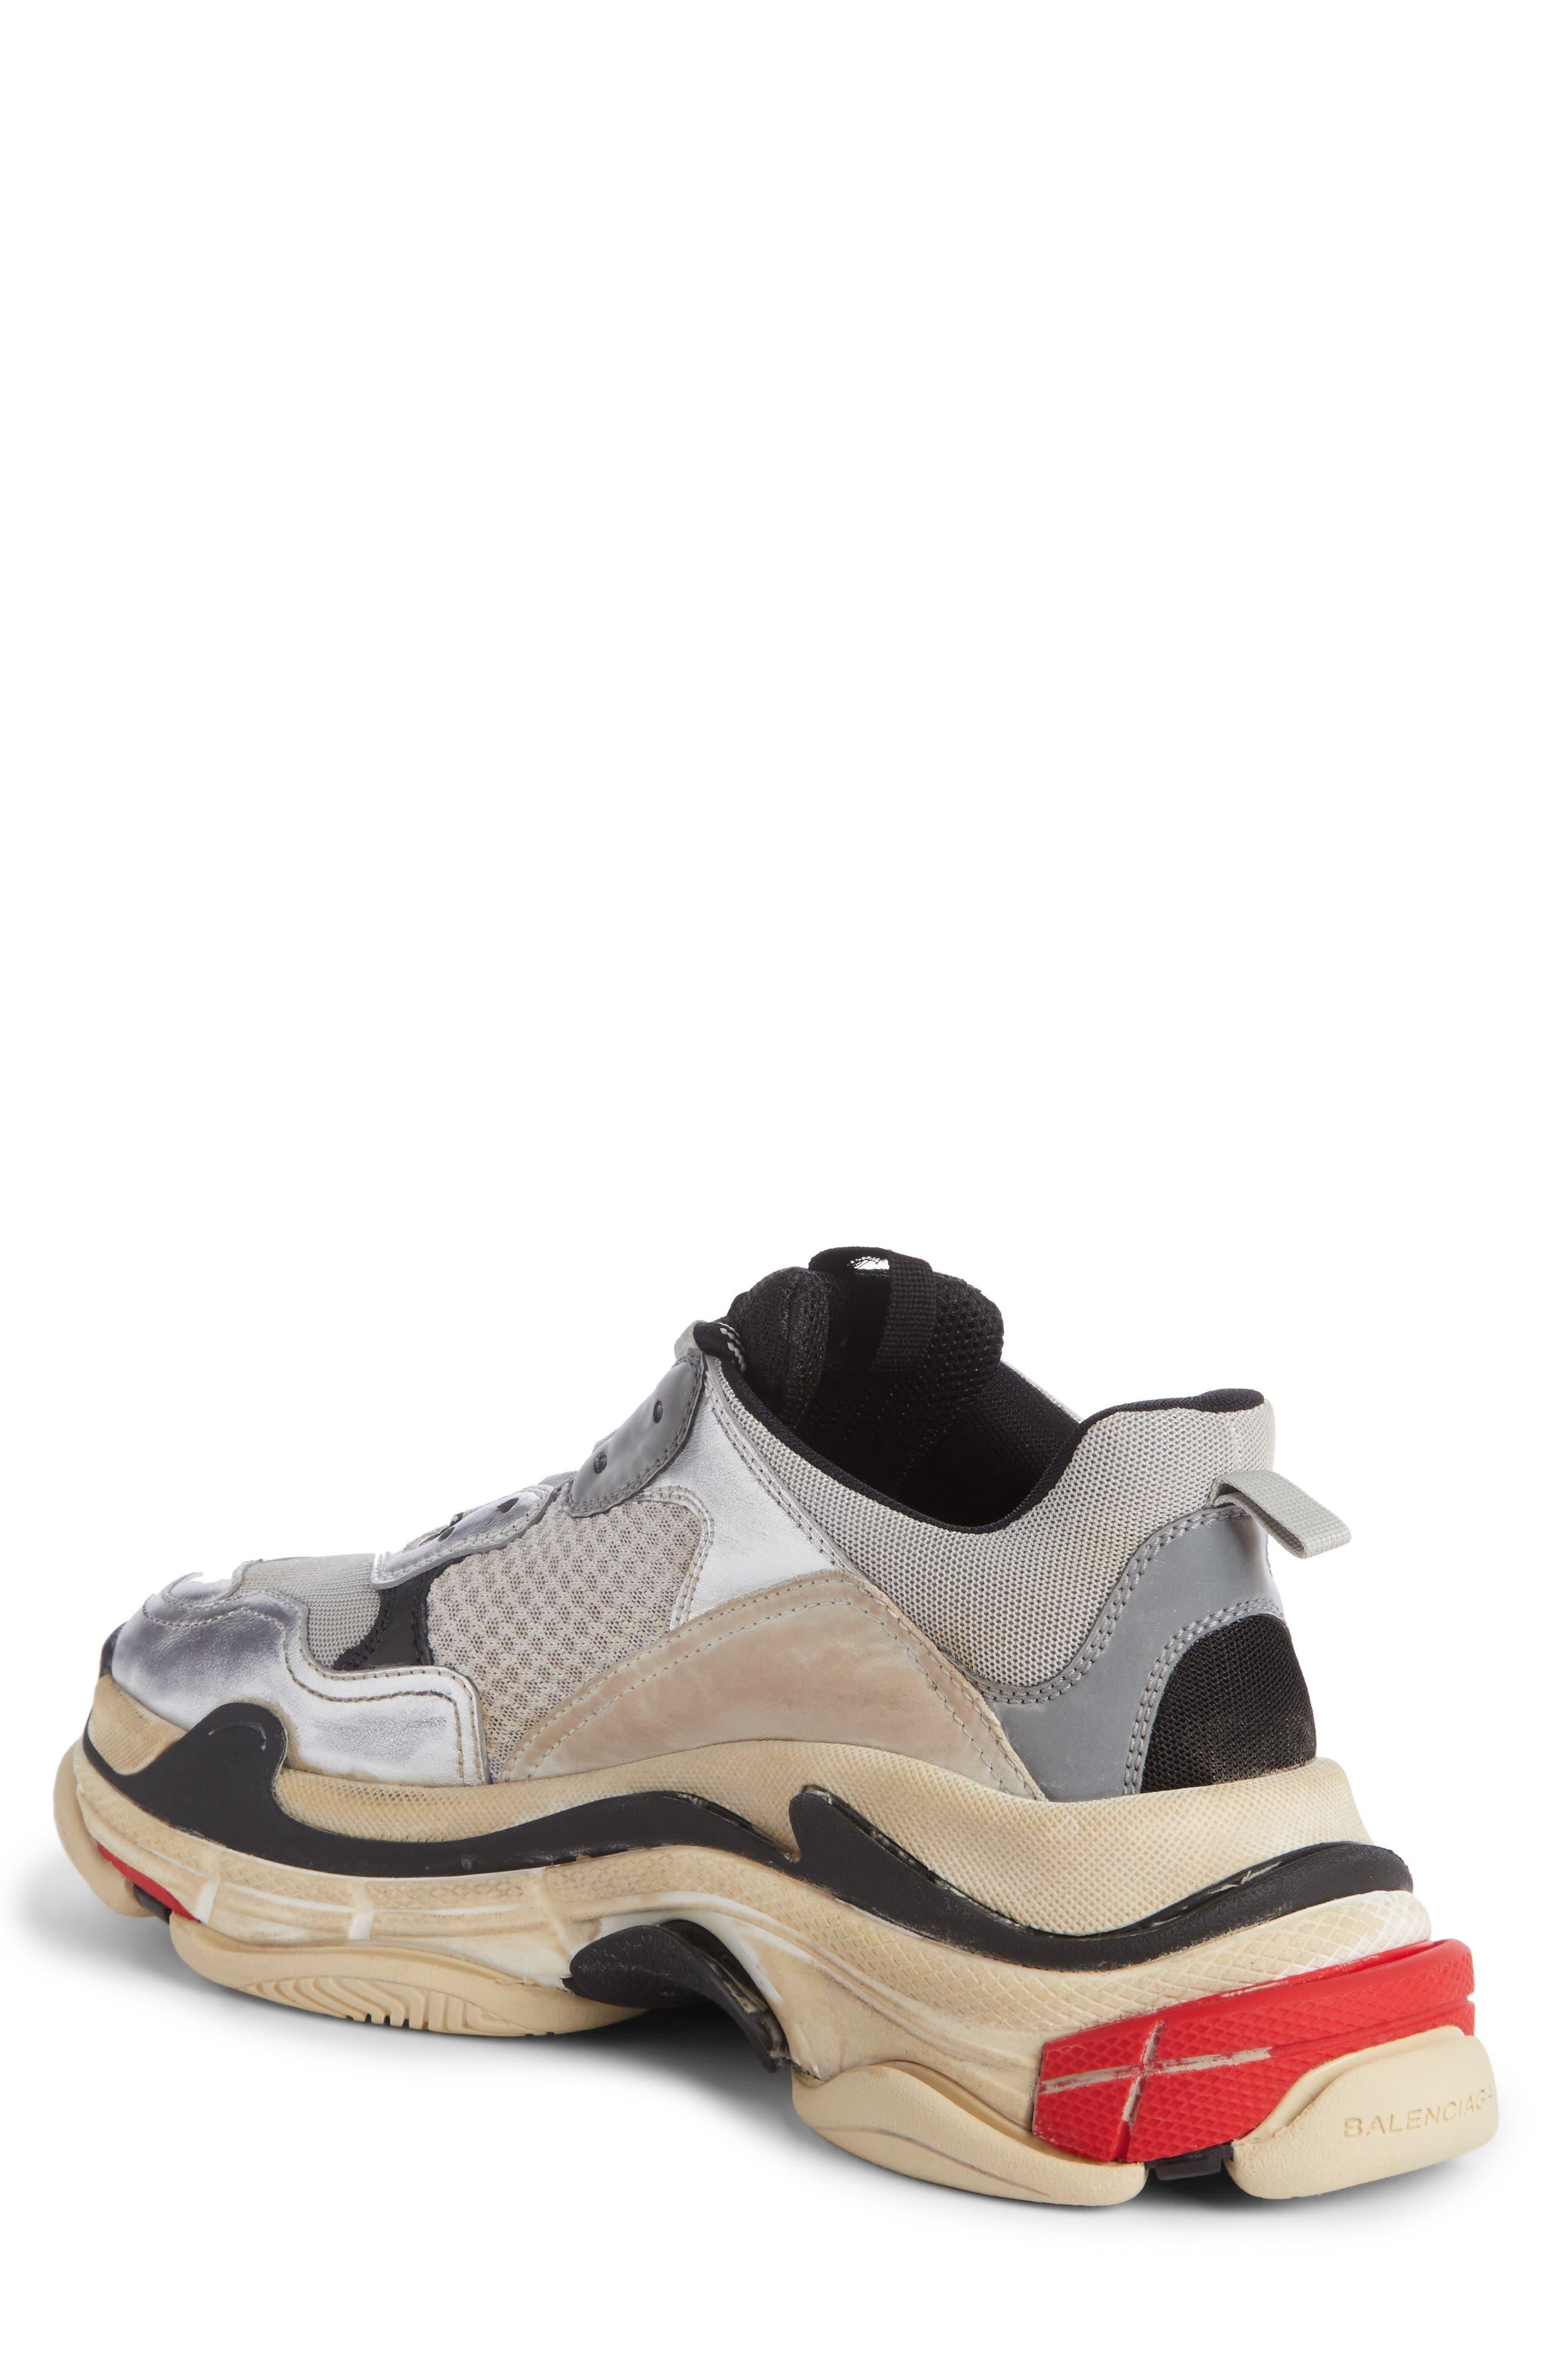 Alternate Image 2  - Balenciaga Triple S Retro Sneaker (Men)